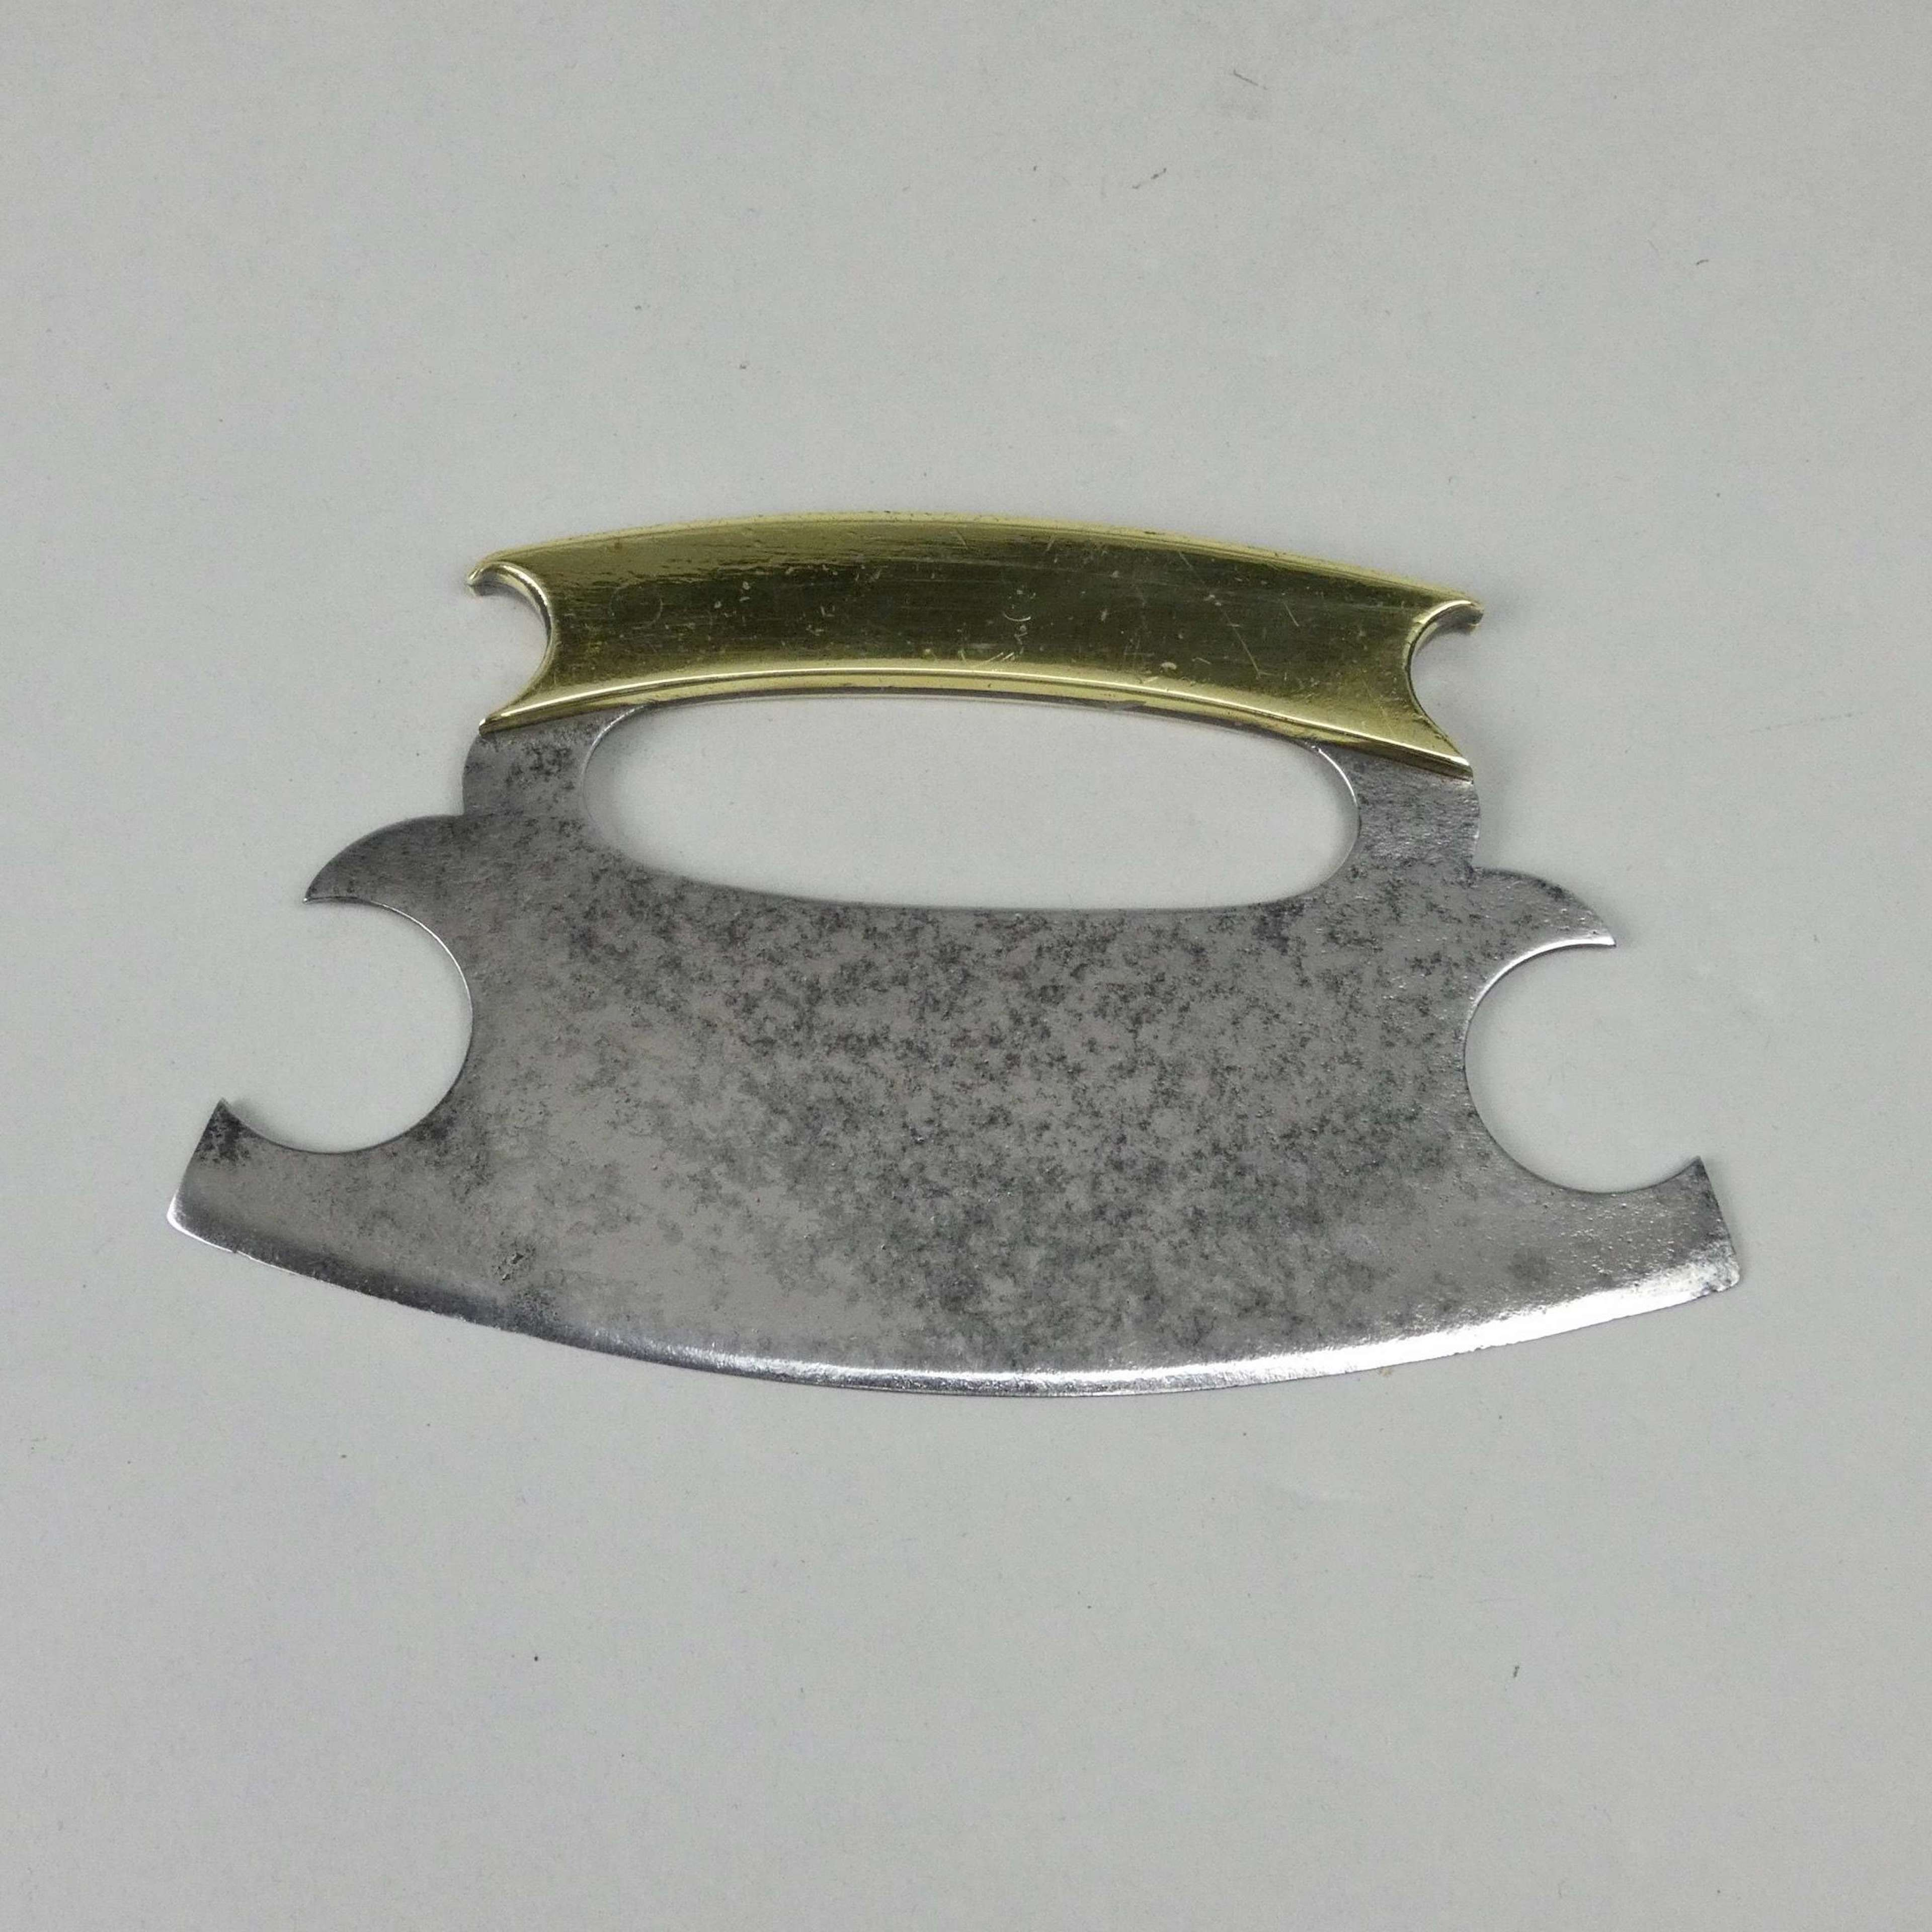 Steel & brass herb chopper